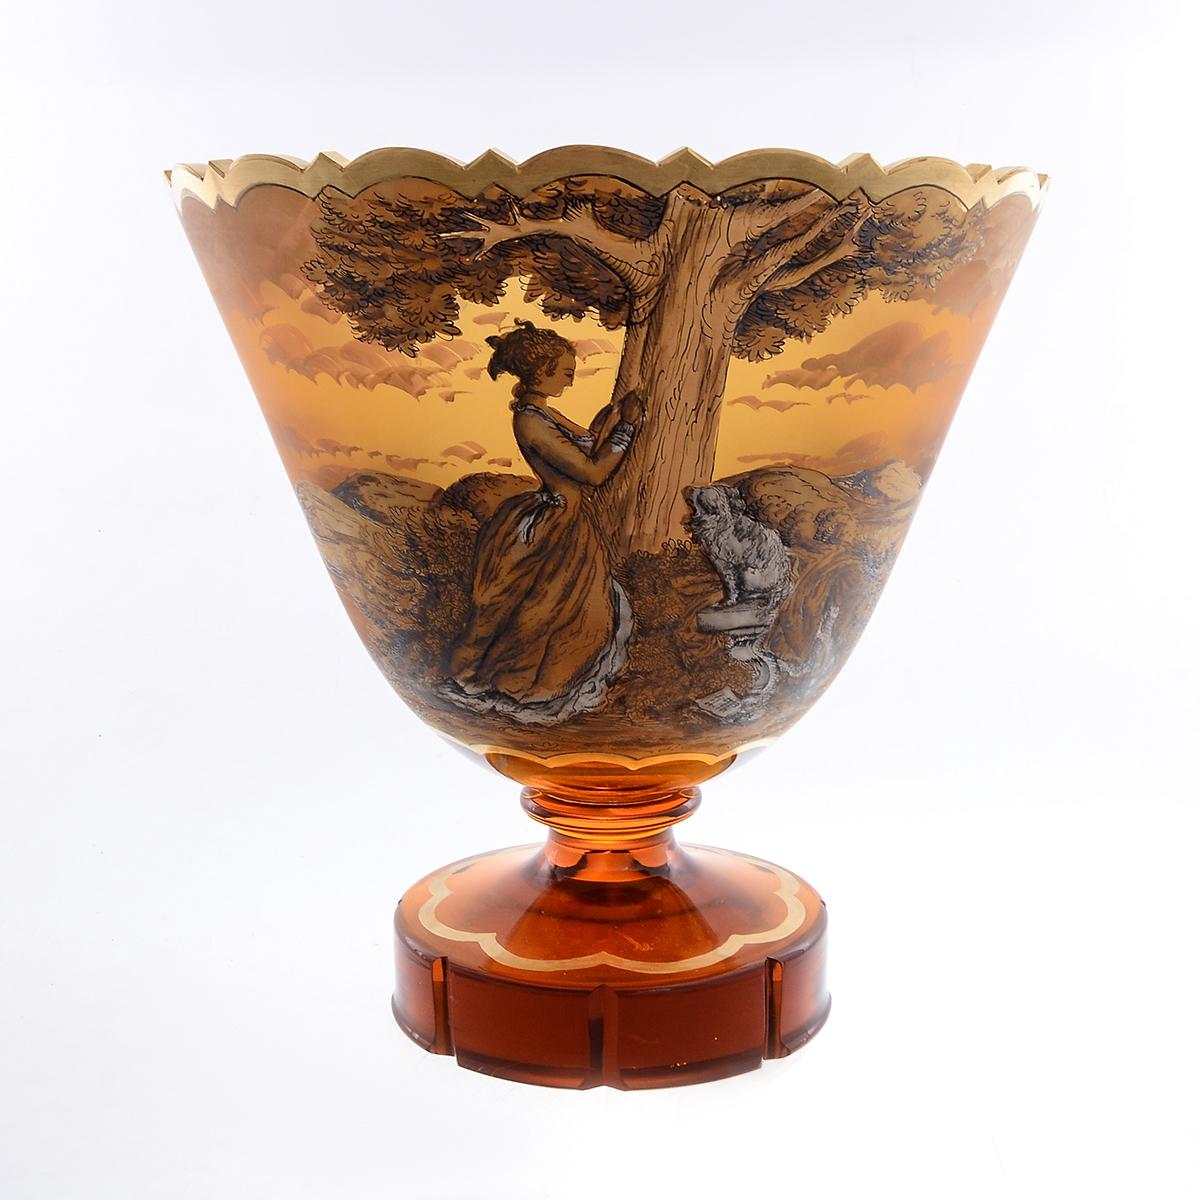 Конфетница 22 см из стекла янтарного цвета от Egermann